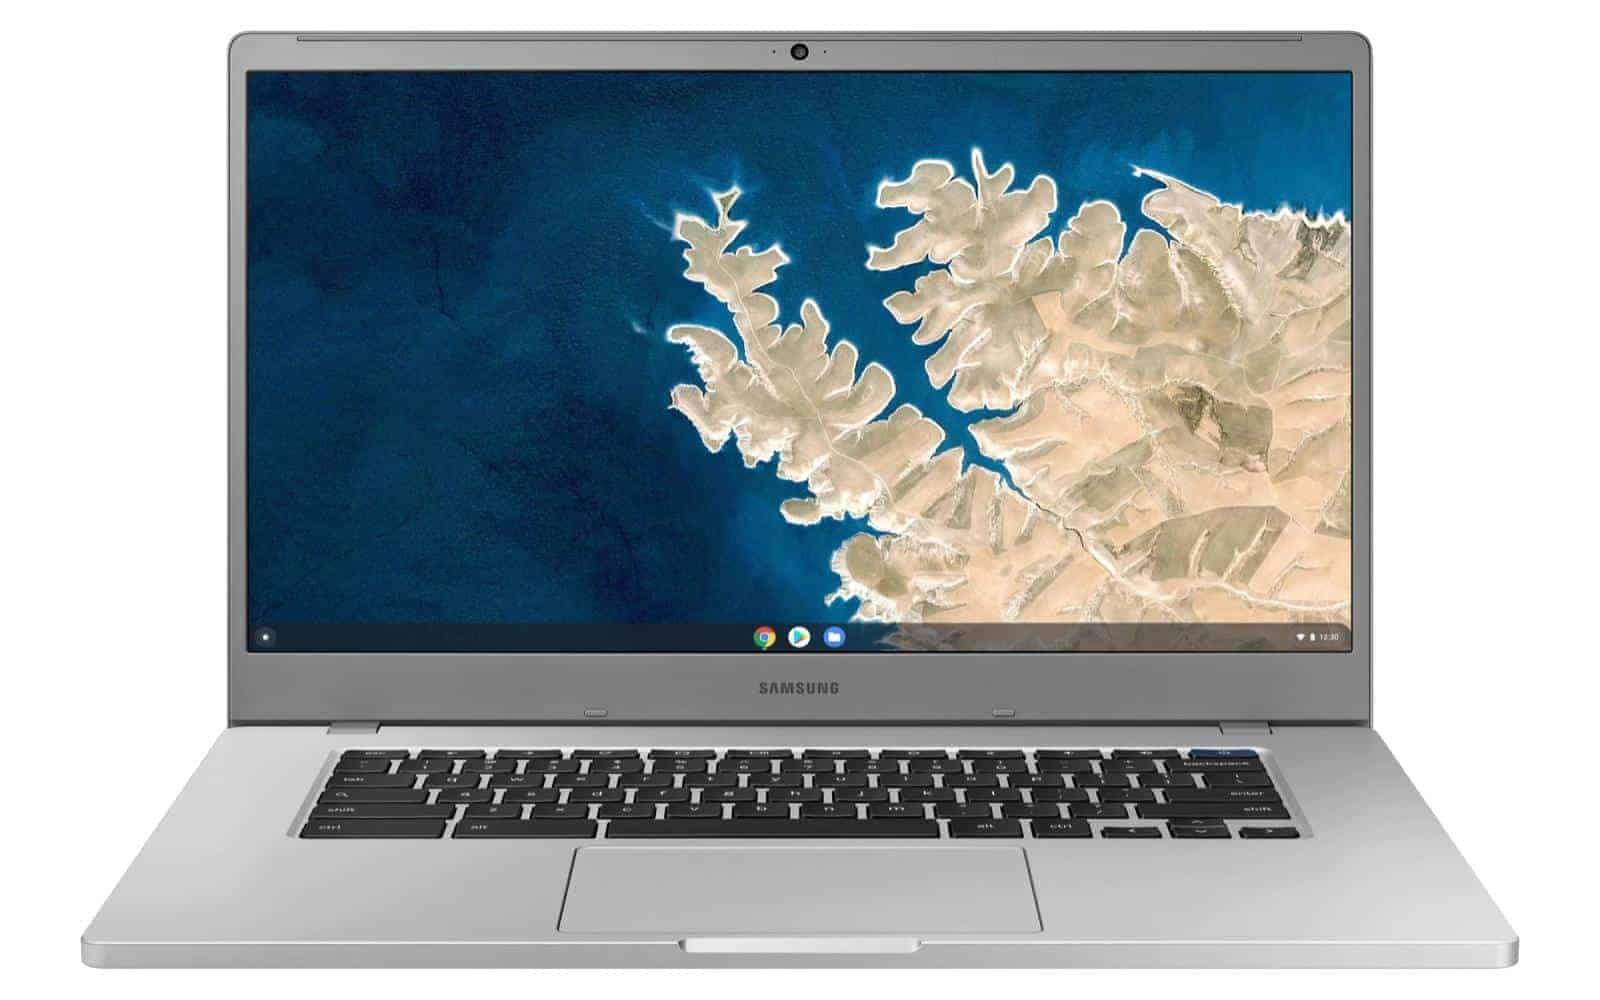 Samsung Chromebook 4 product img